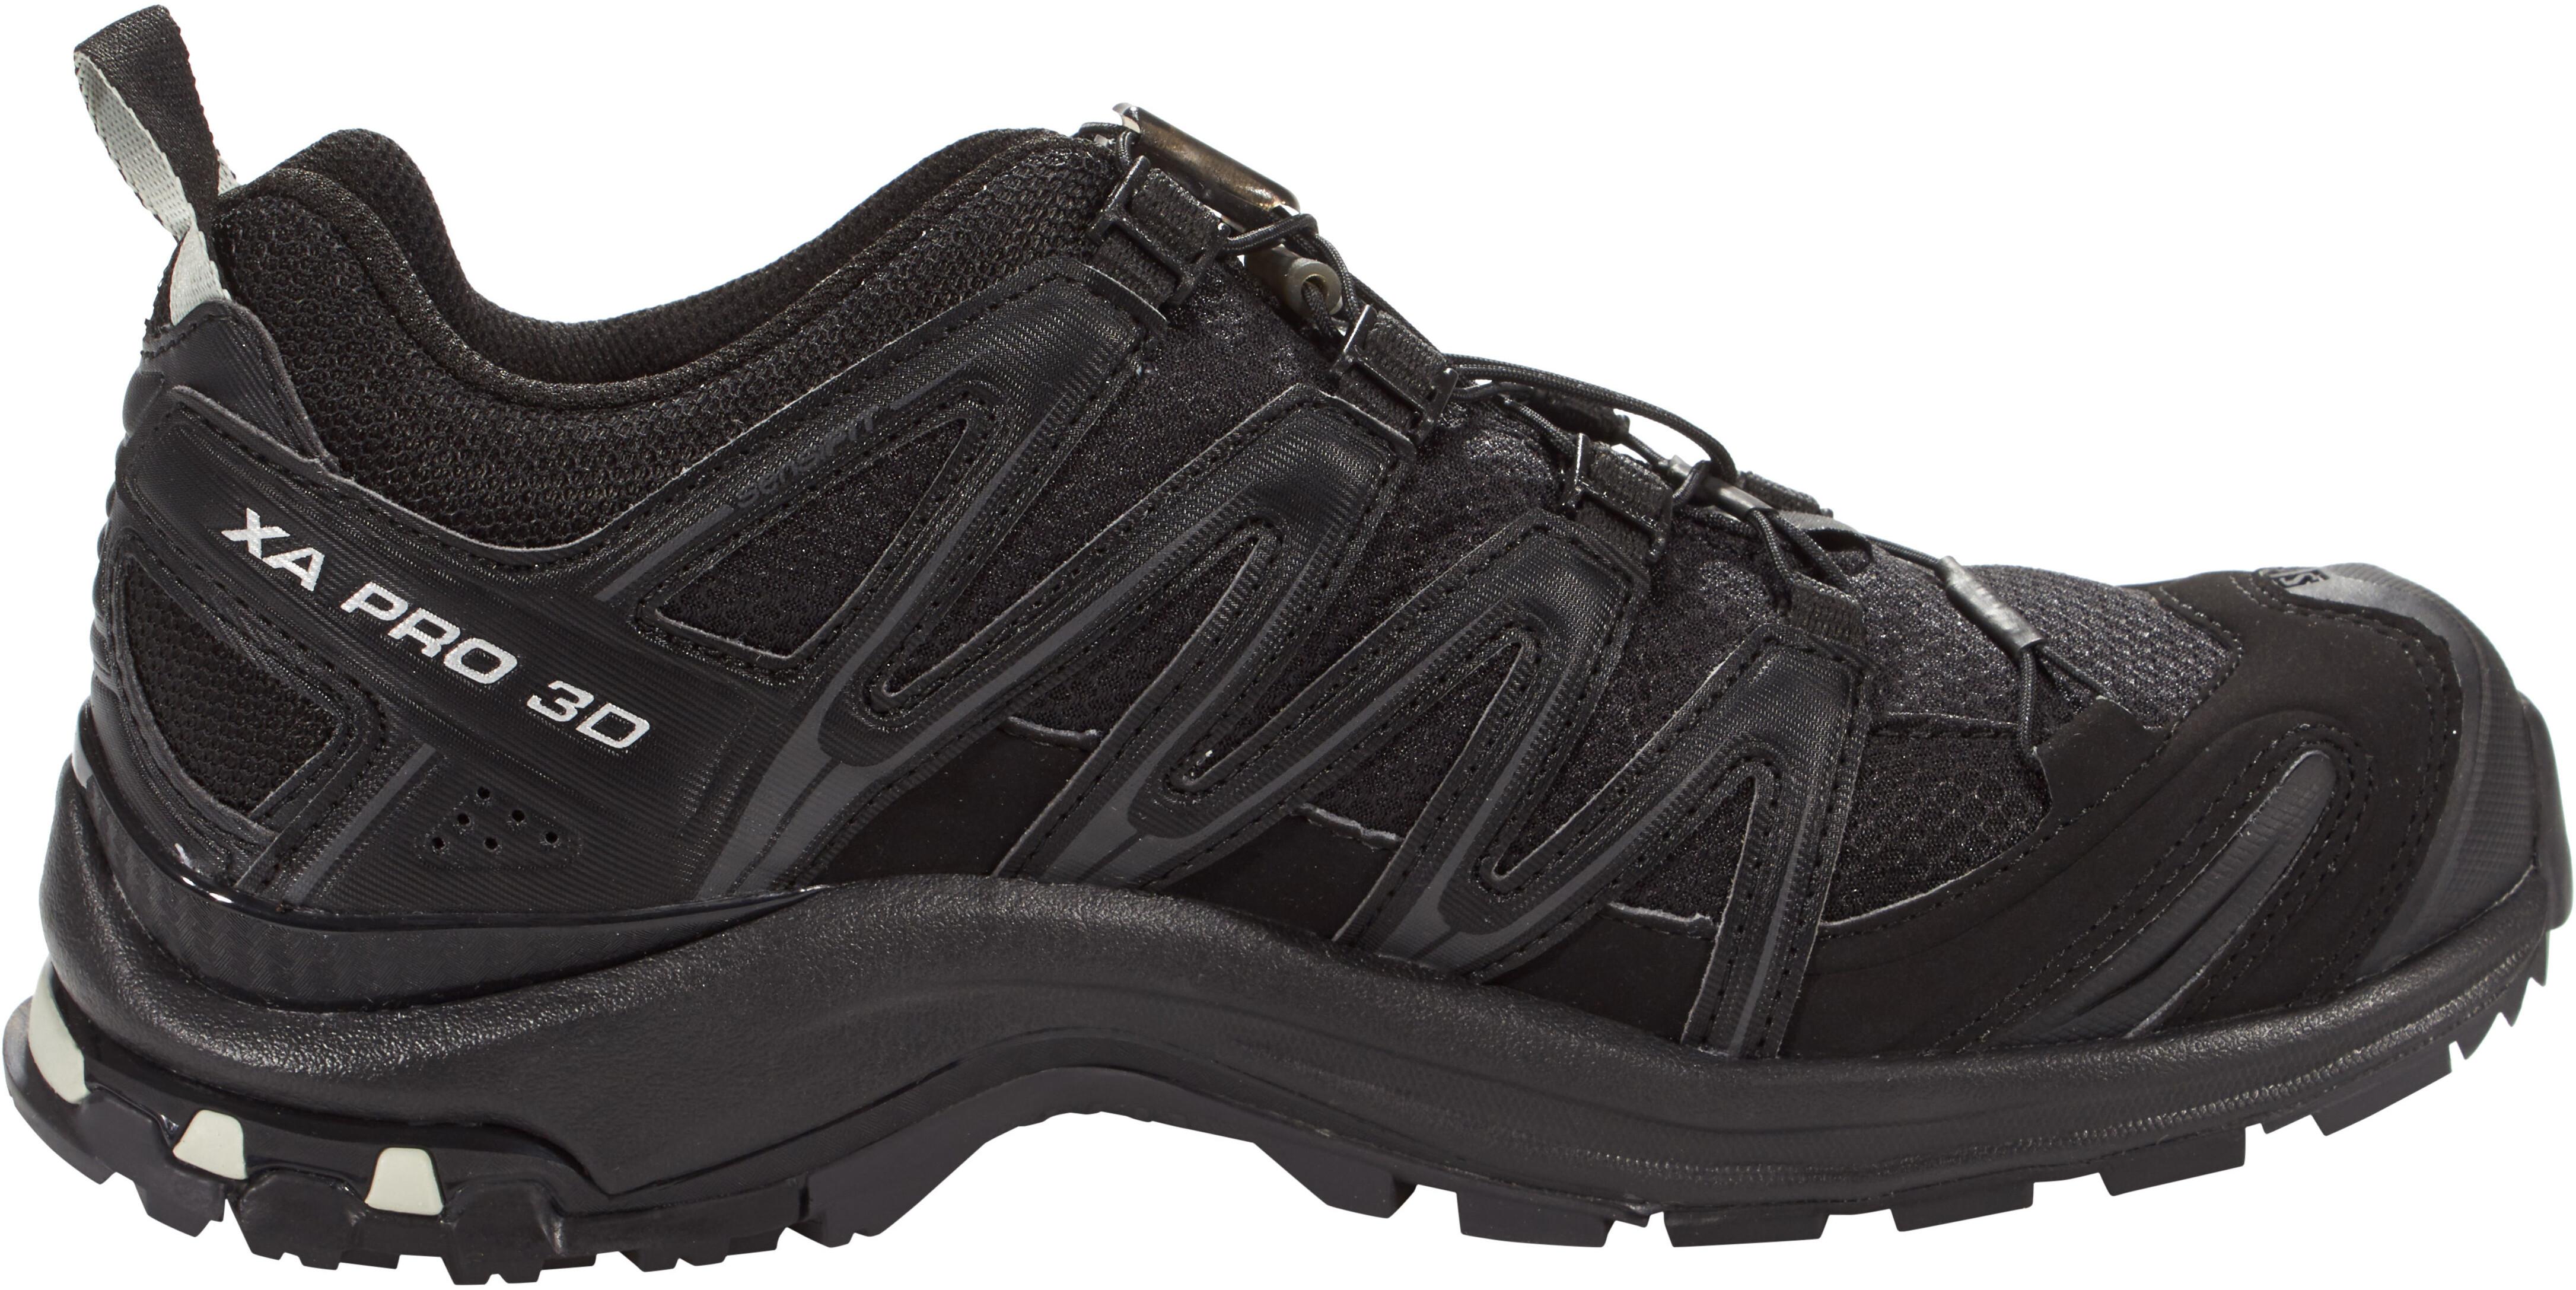 a5942f02ef7 Salomon XA Pro 3D GTX Hardloopschoenen Dames, black/black/mineral grey